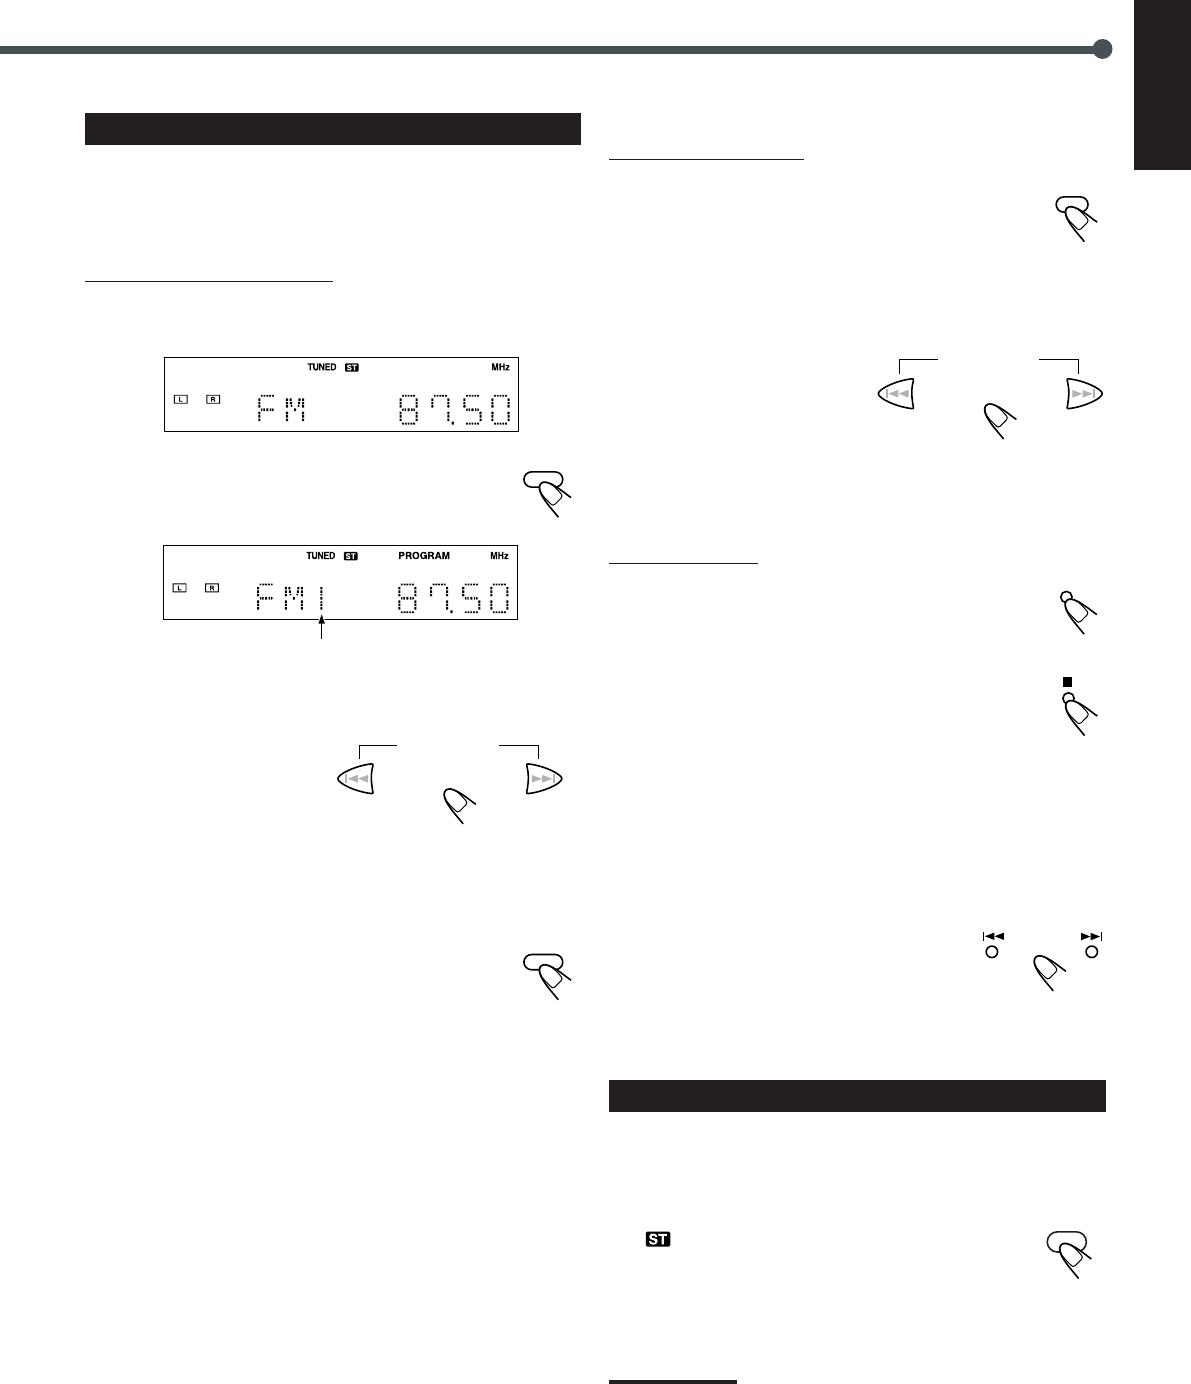 JVC TH A30 A30[UW] User Manual LVT0945 007A